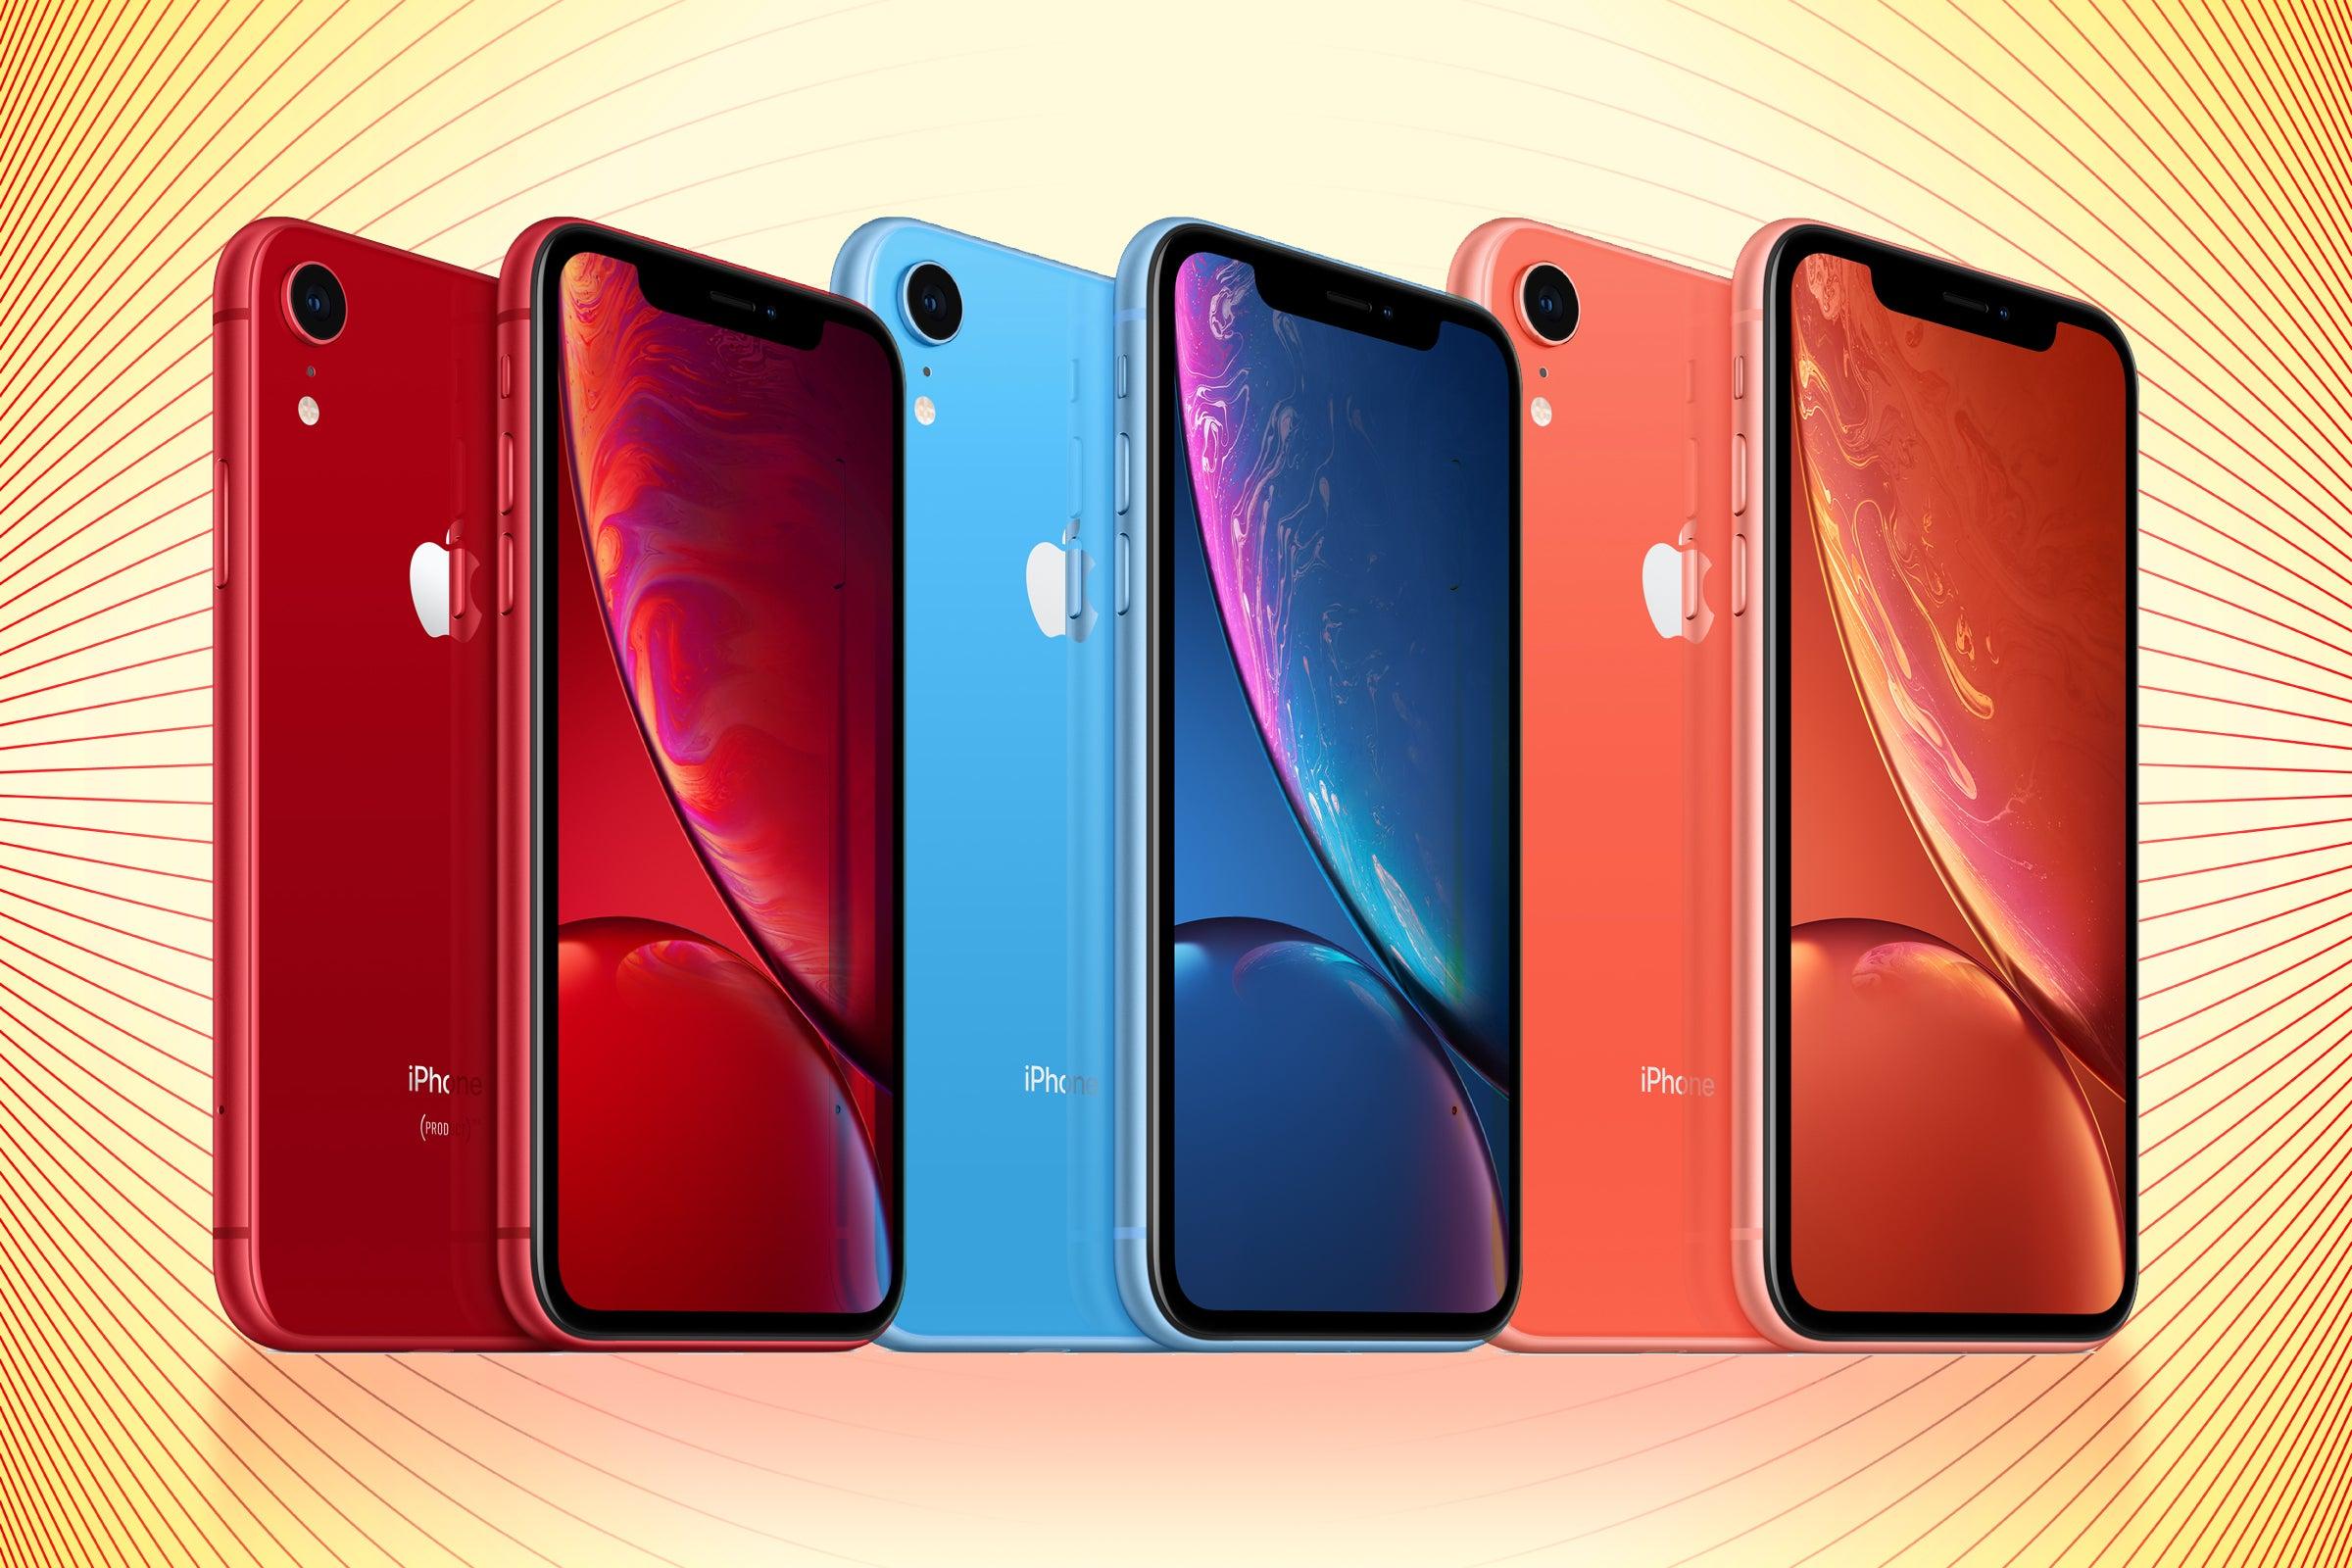 The 5 best smartphones for business in 2019 | Computerworld